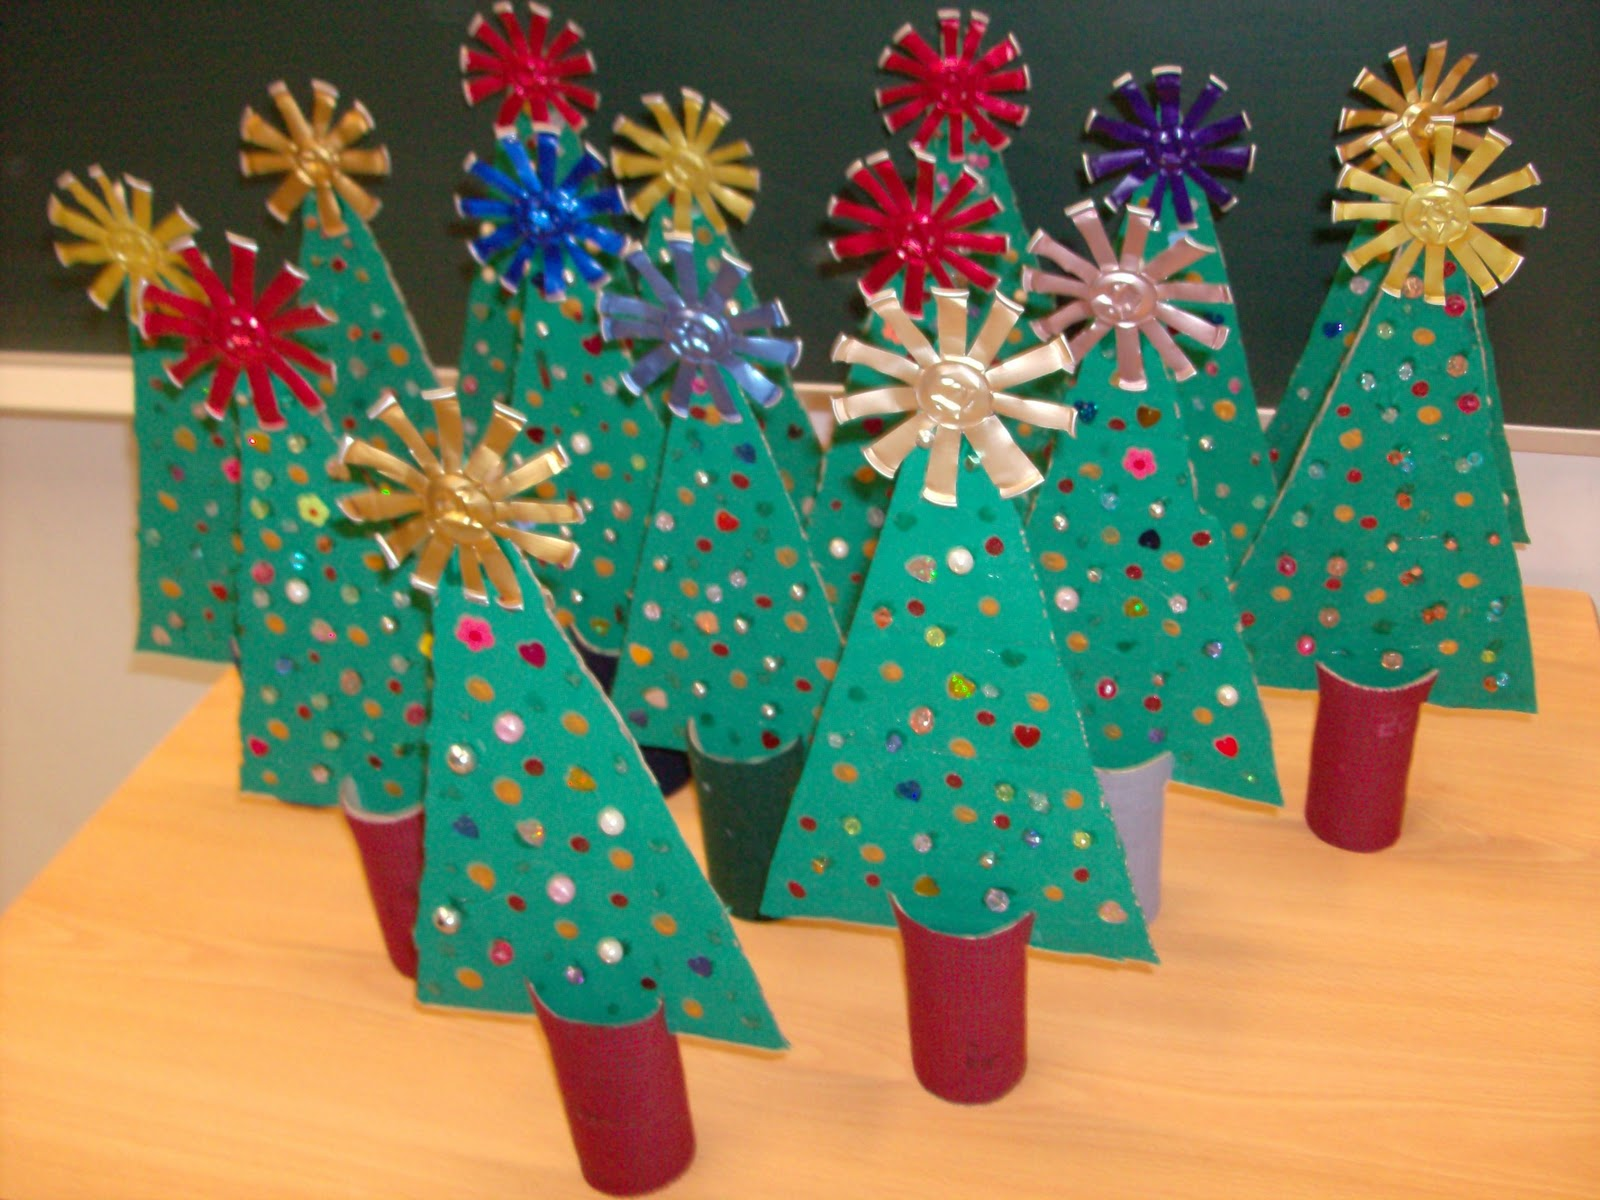 Reuse Crafts: Christmas Tree Cardboard Craft